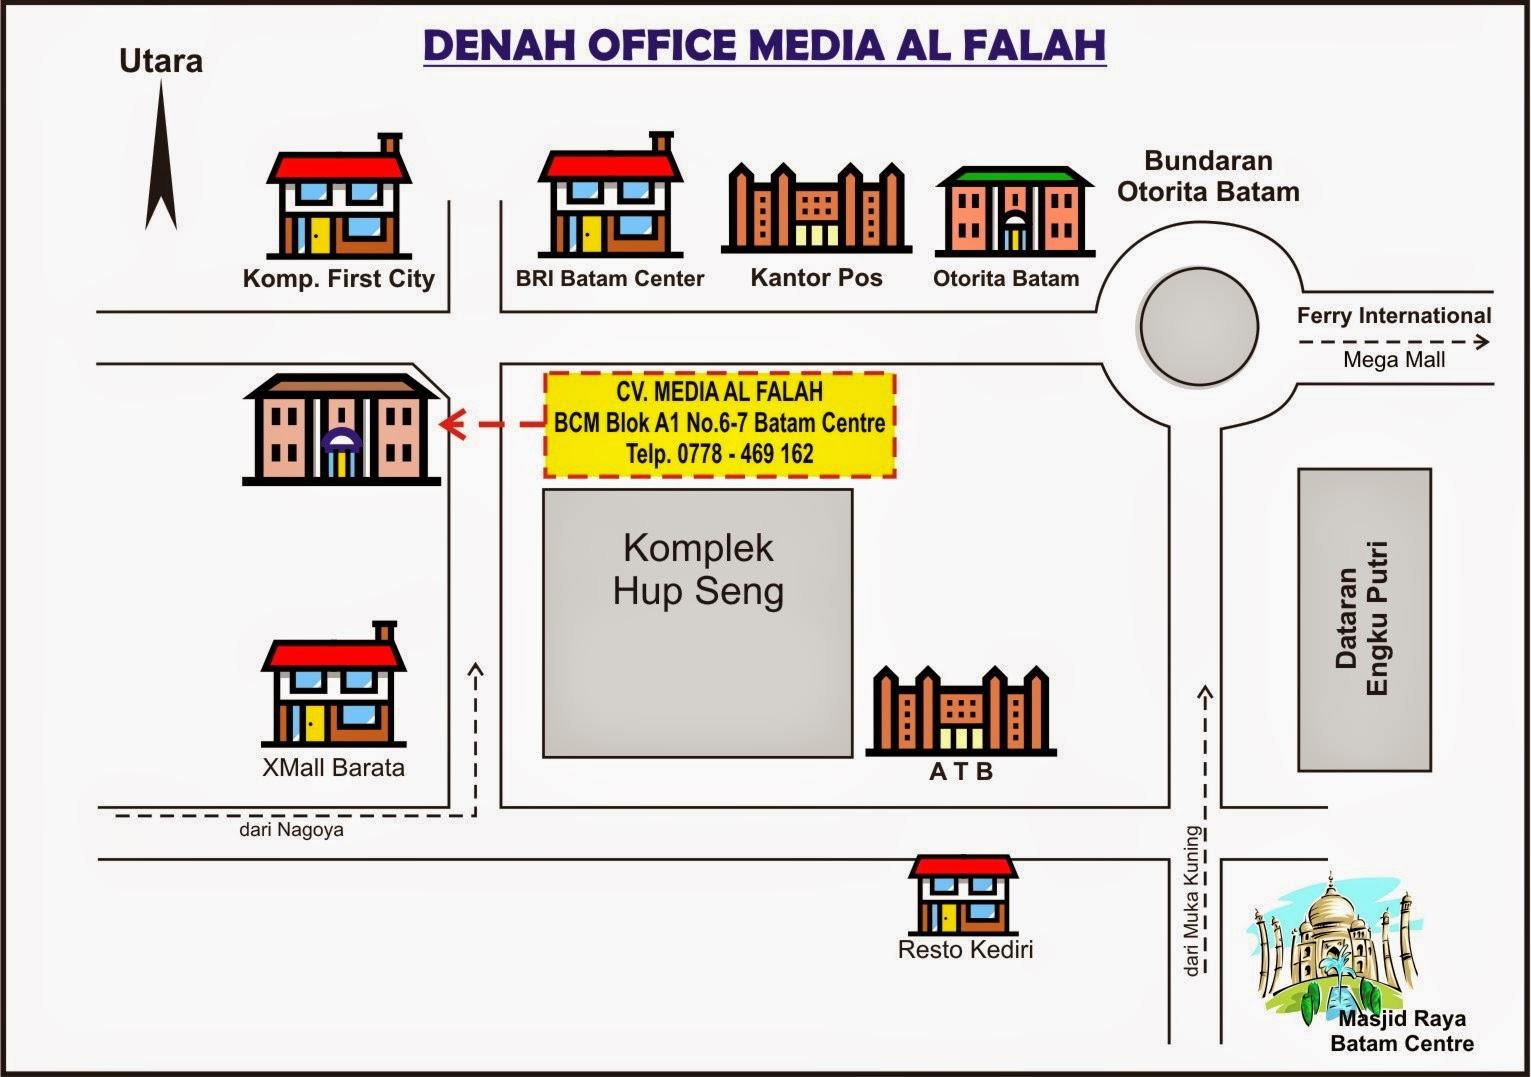 Kumpulan Soal Fiqih Sd Link Link Blog Kumpulan Soal Ukk Fiqih Sd Mi Semester 2 Download